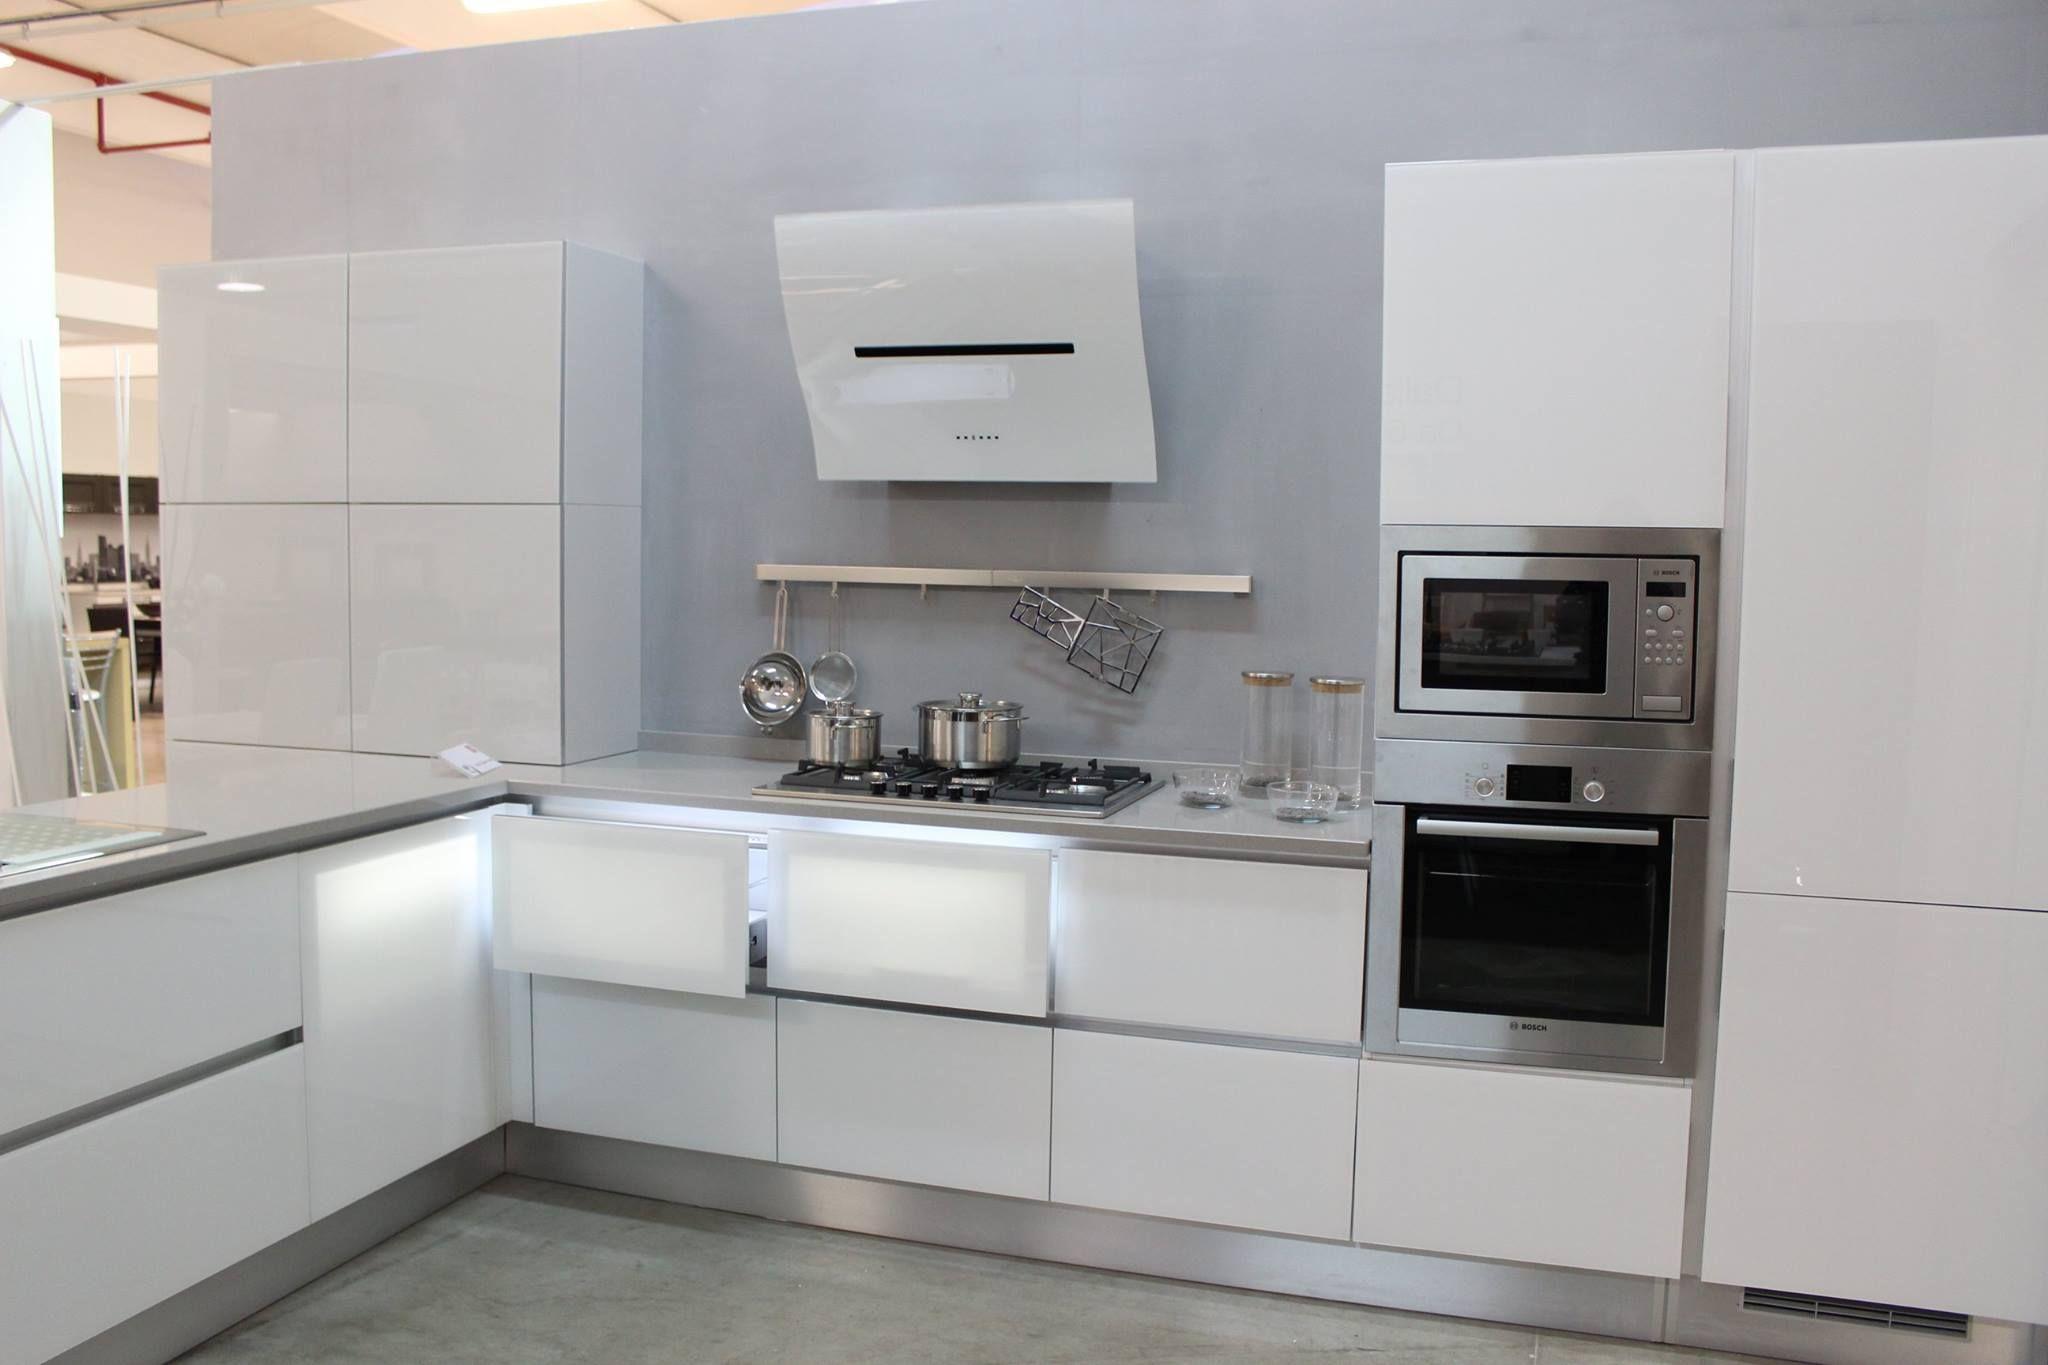 ciessecucine #ciesse #cucina #kitchen #casa #home #arredamento ... - Arredamento Casa Home